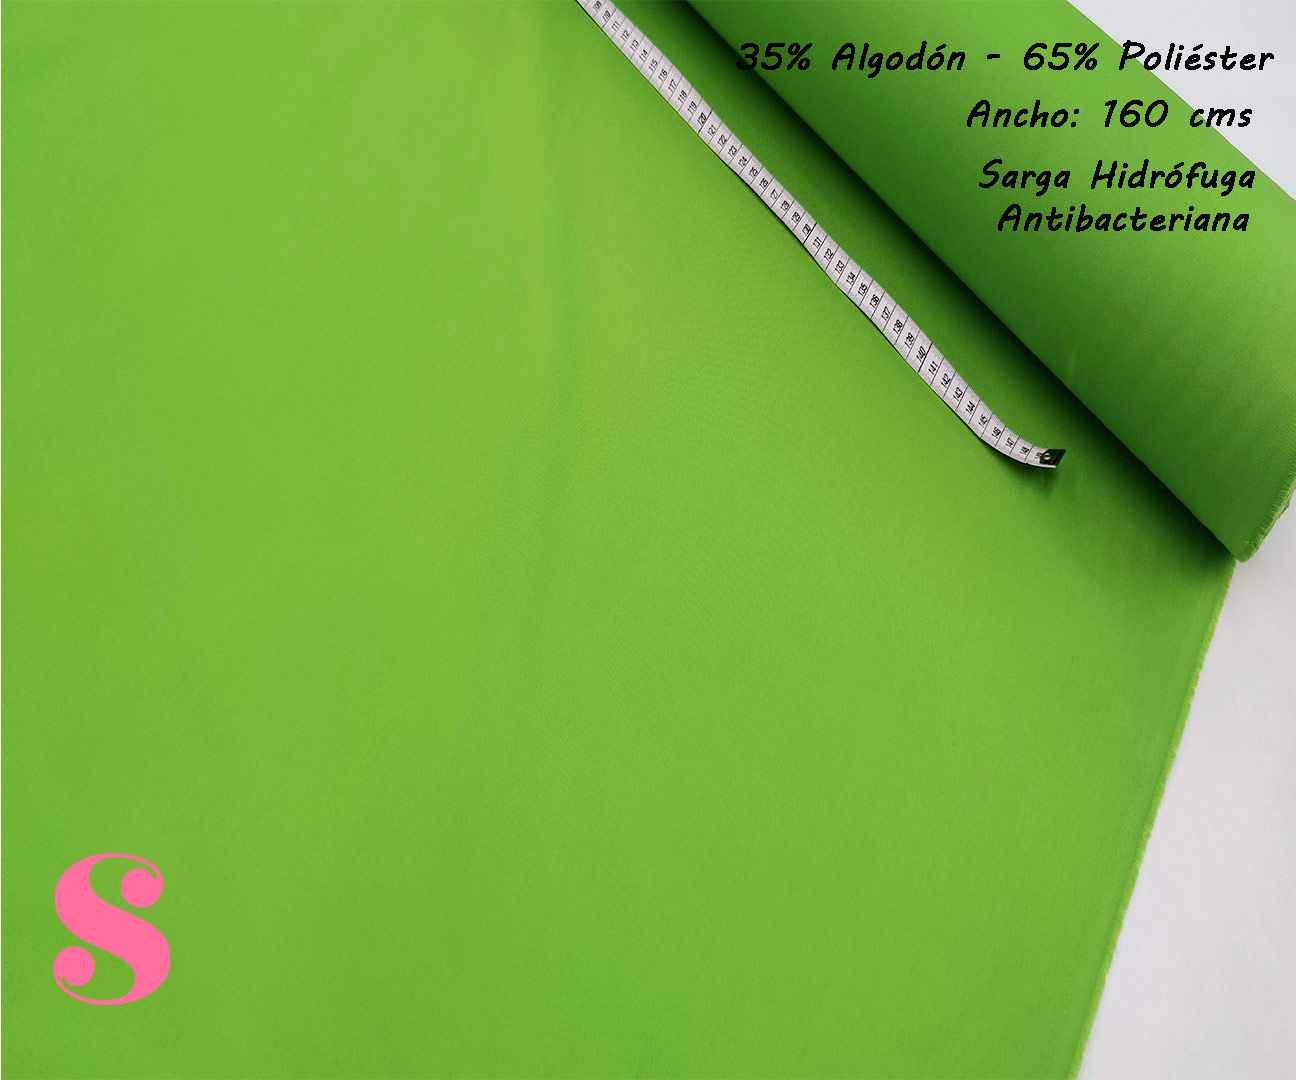 sarga-verde-hidrofuga-antibacteriana-homologada-certificada-poliester-algodon,Sarga Hidrófuga Antibacteriana Verde